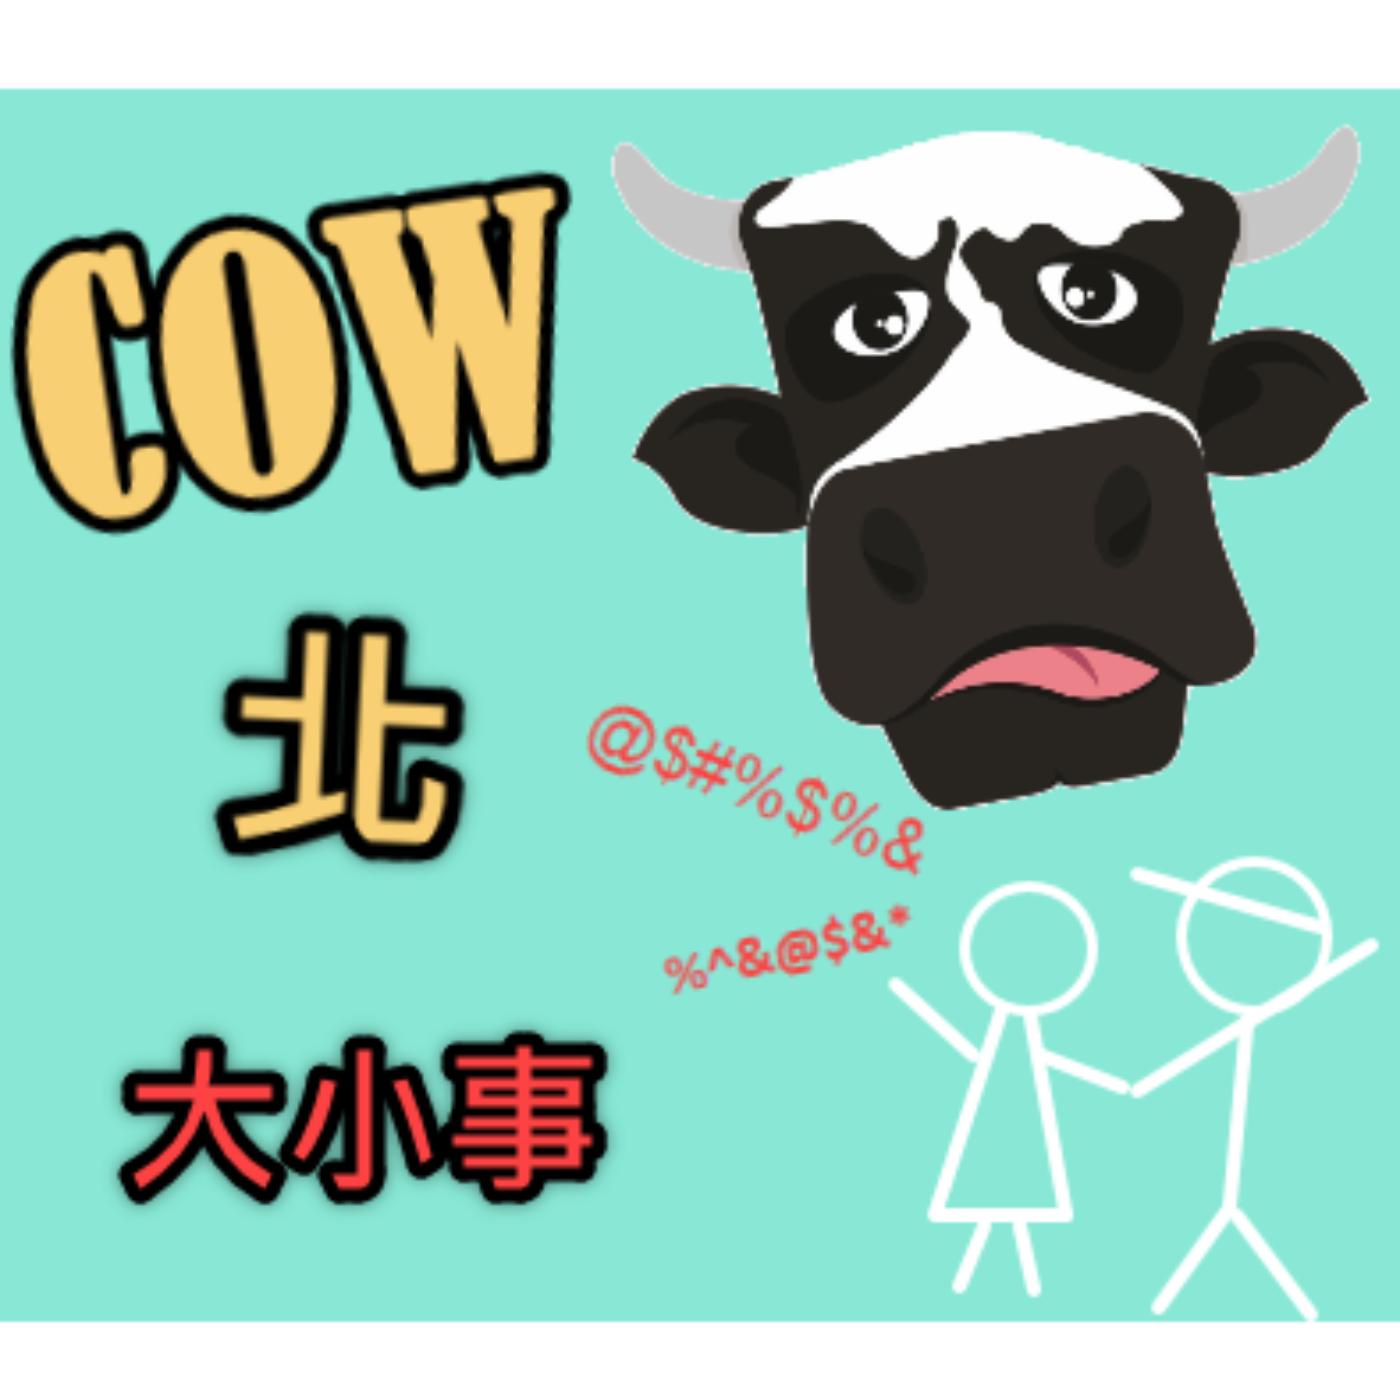 COW北大小事